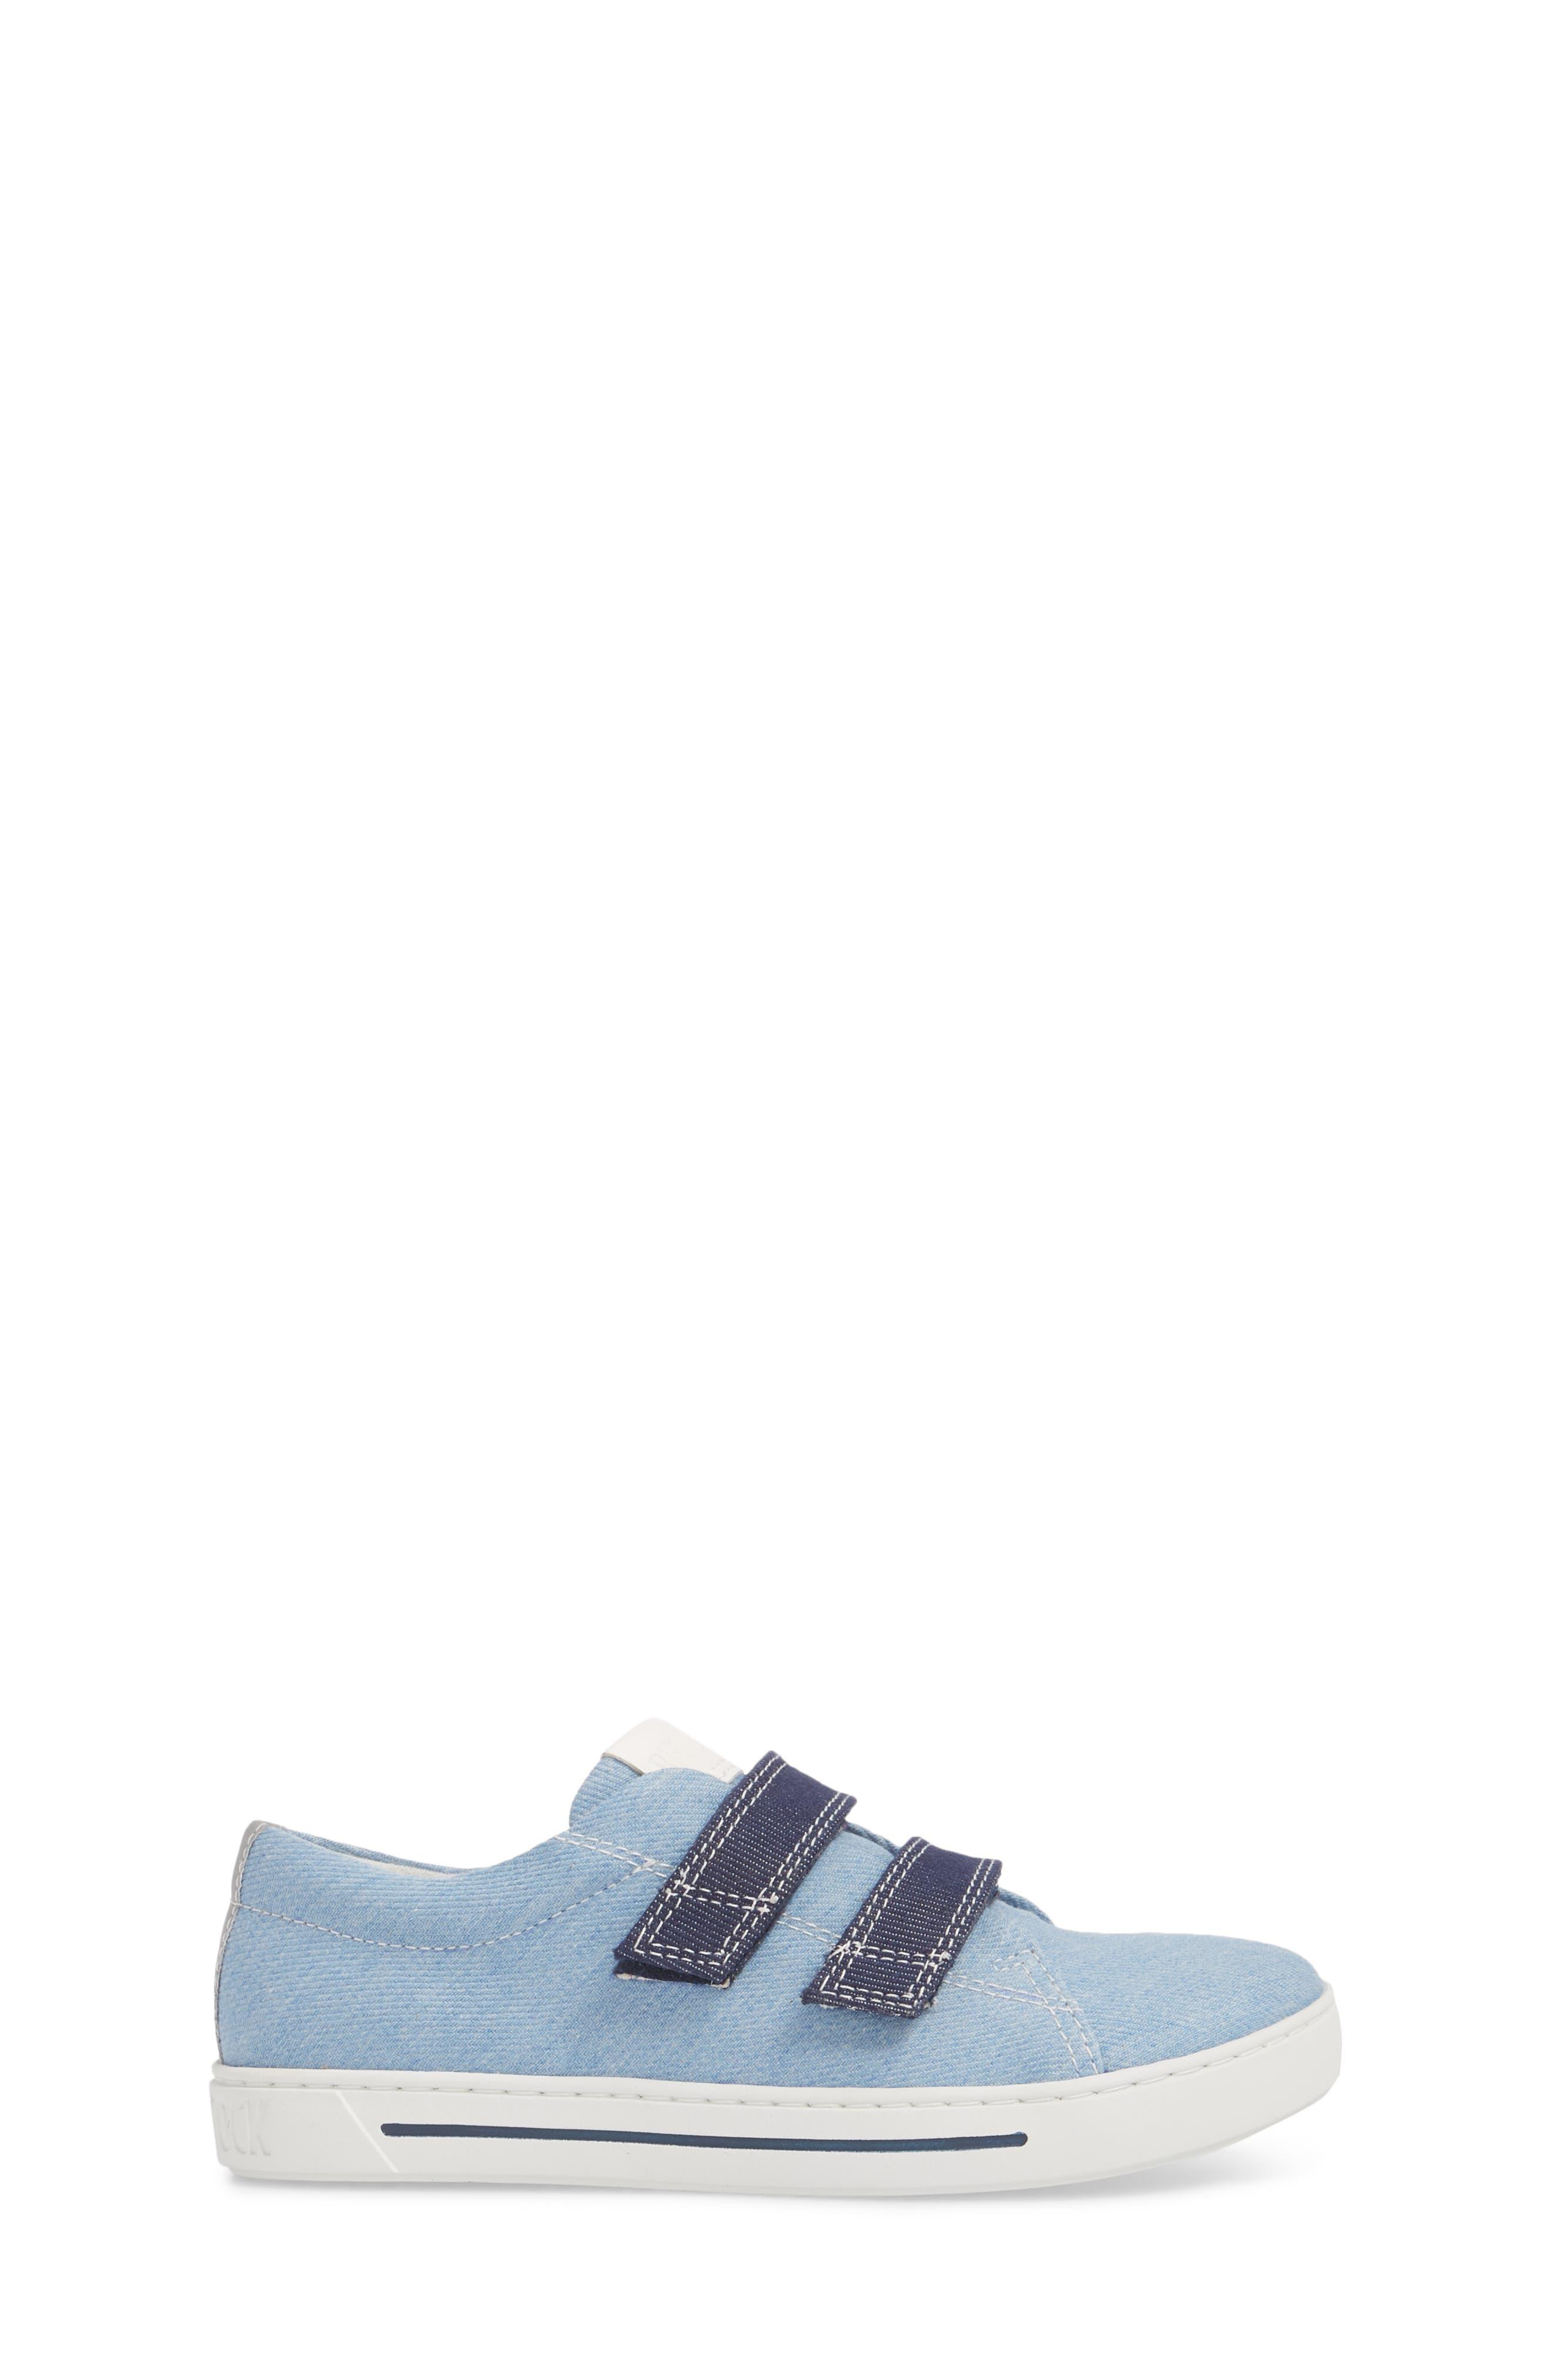 Arran Sneaker,                             Alternate thumbnail 3, color,                             400